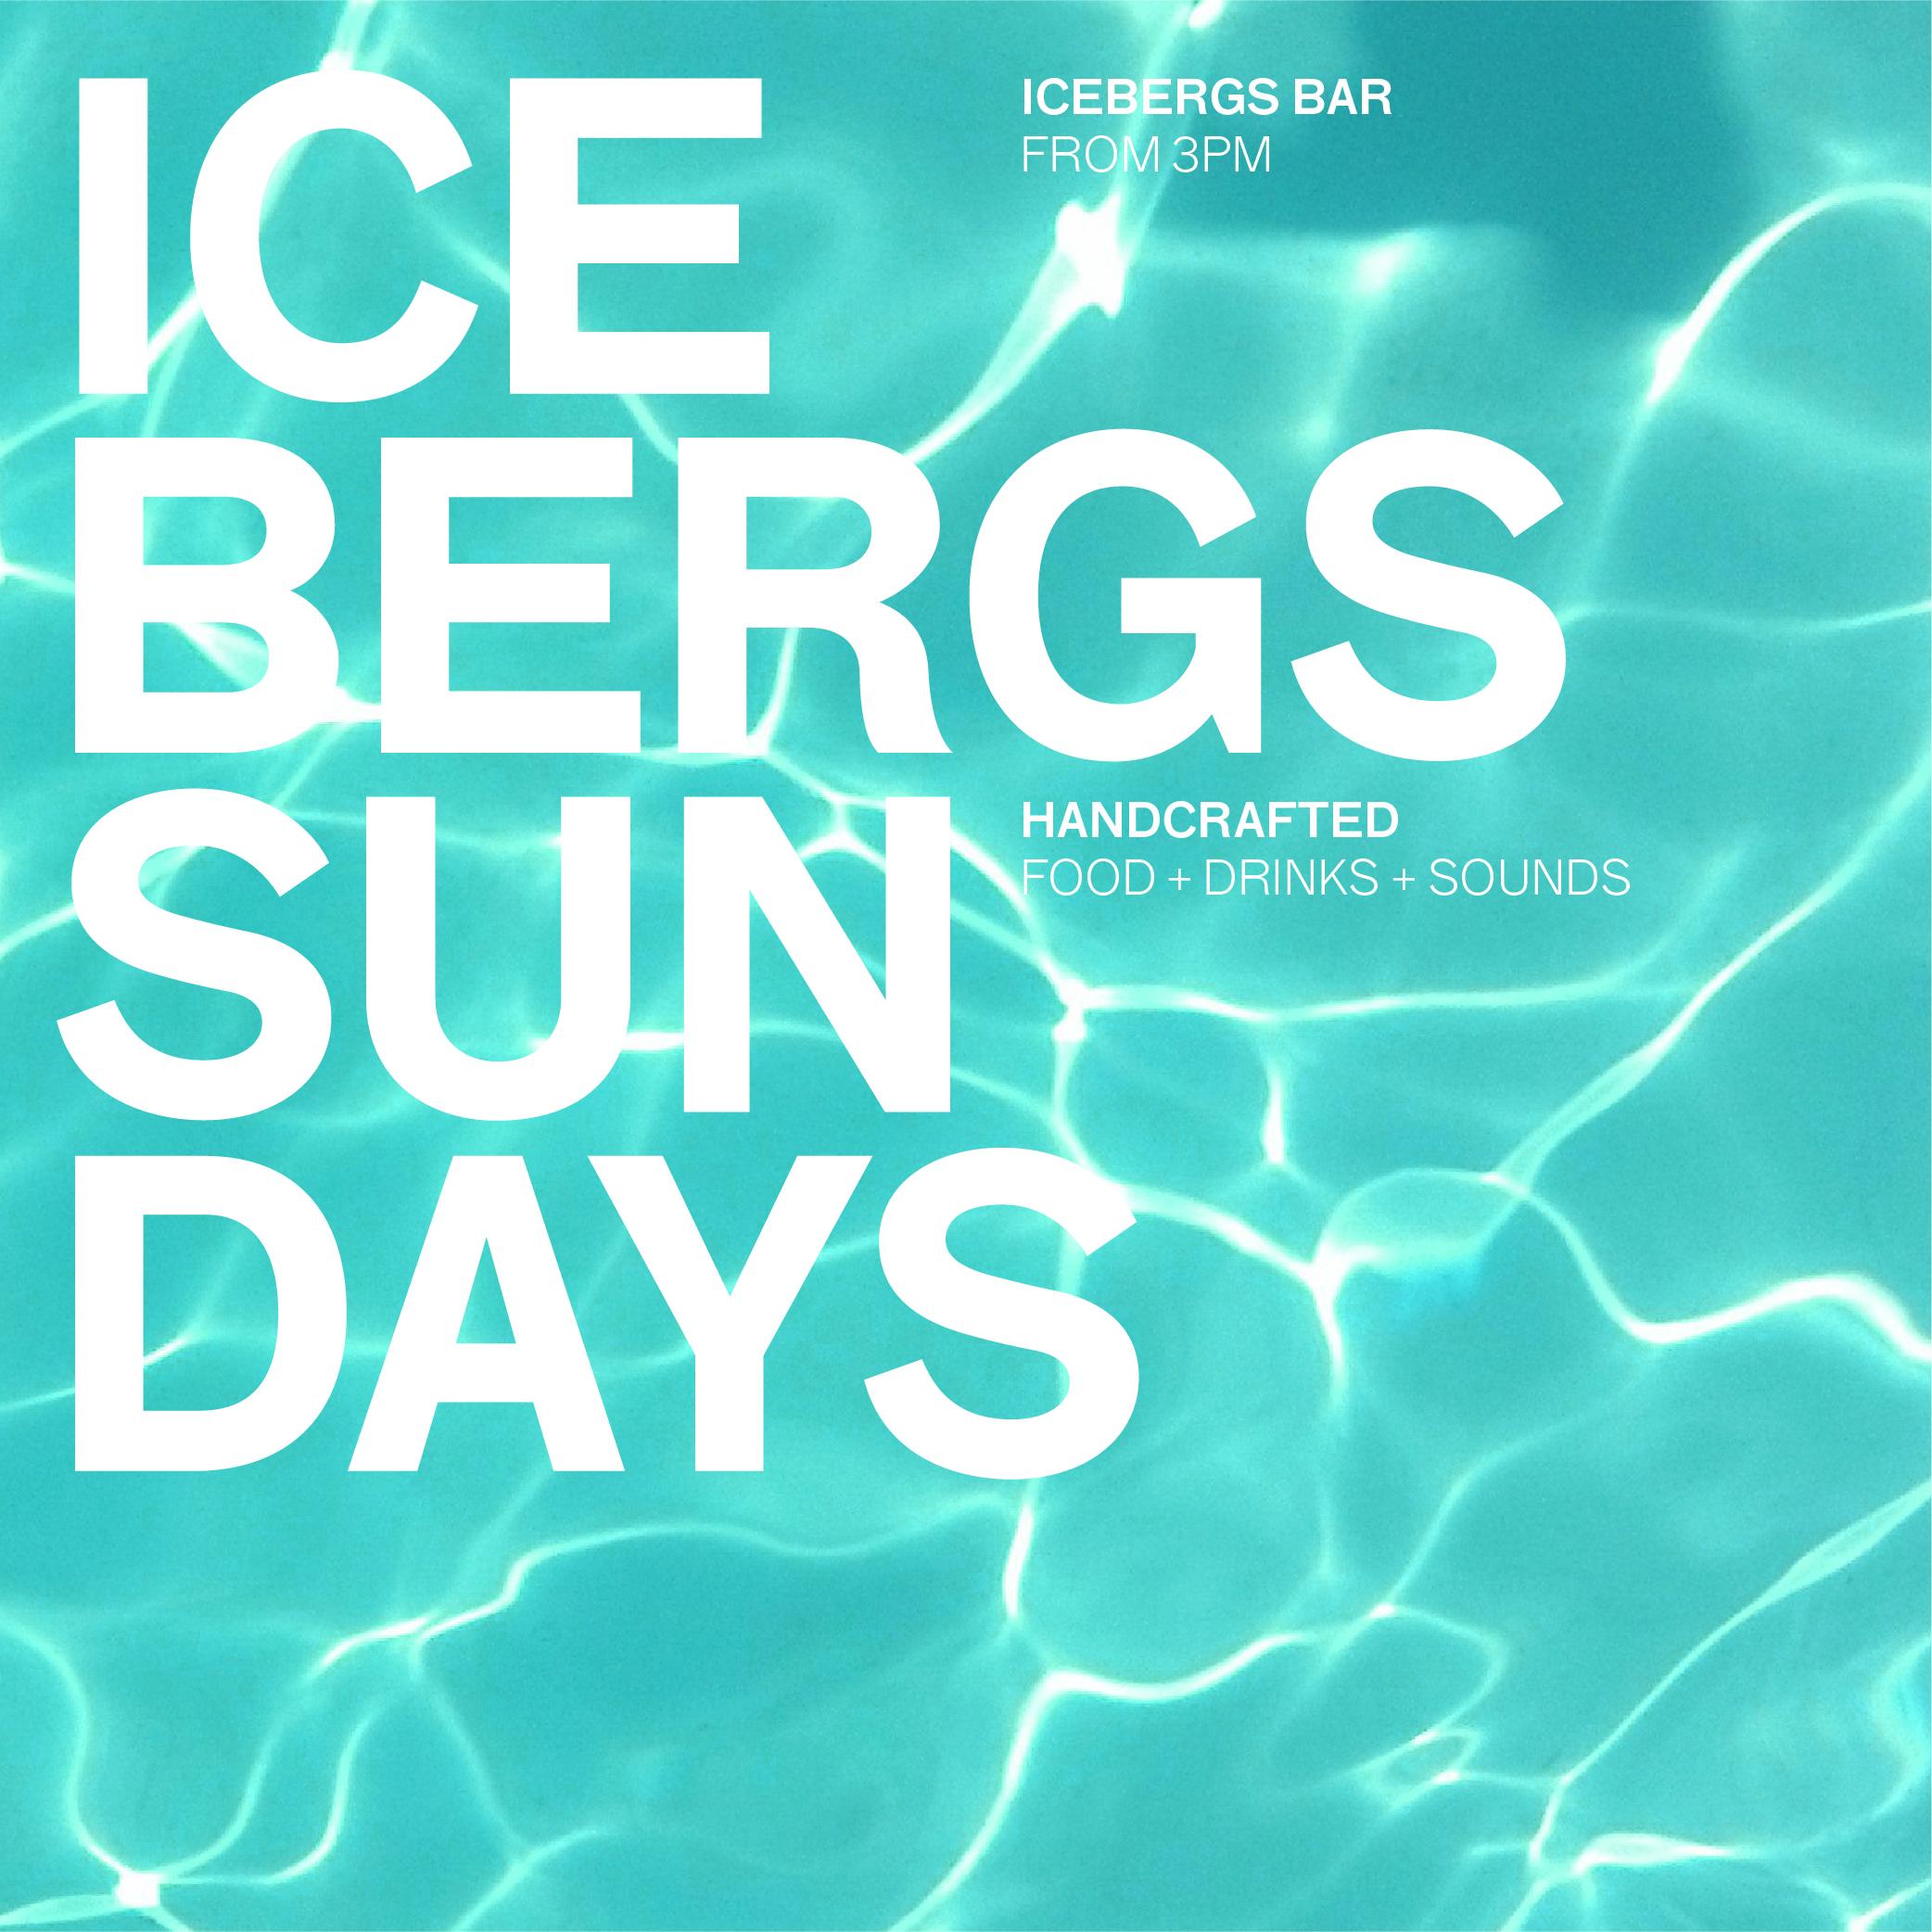 Icebergs Dining Room And Bar: IcebergsSundays_September_Tile : Icebergs Dining Room And